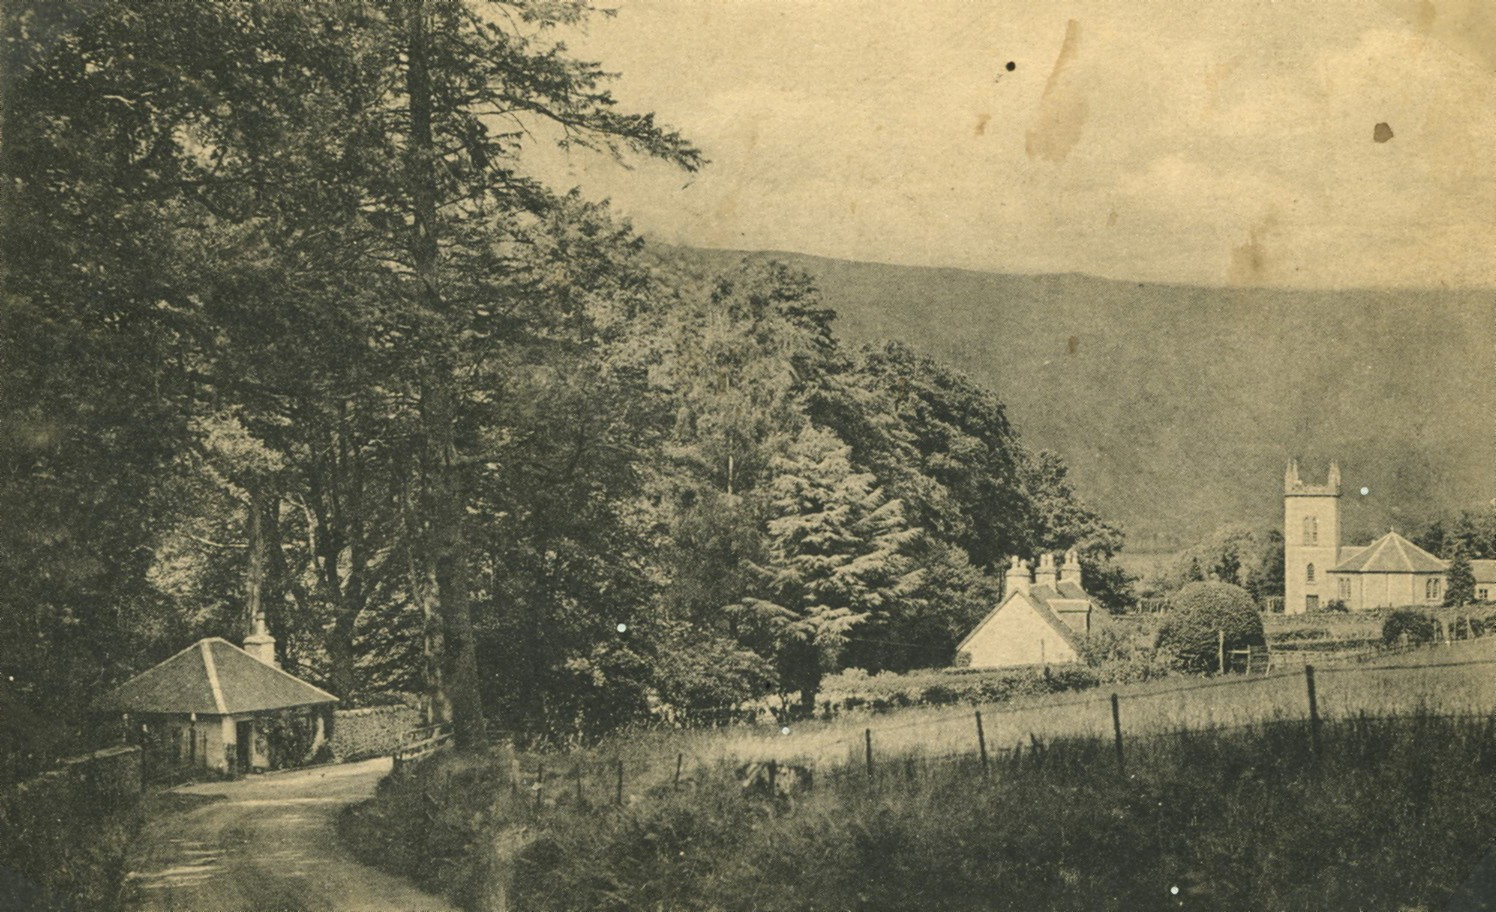 North Lodge at Estate Entrance